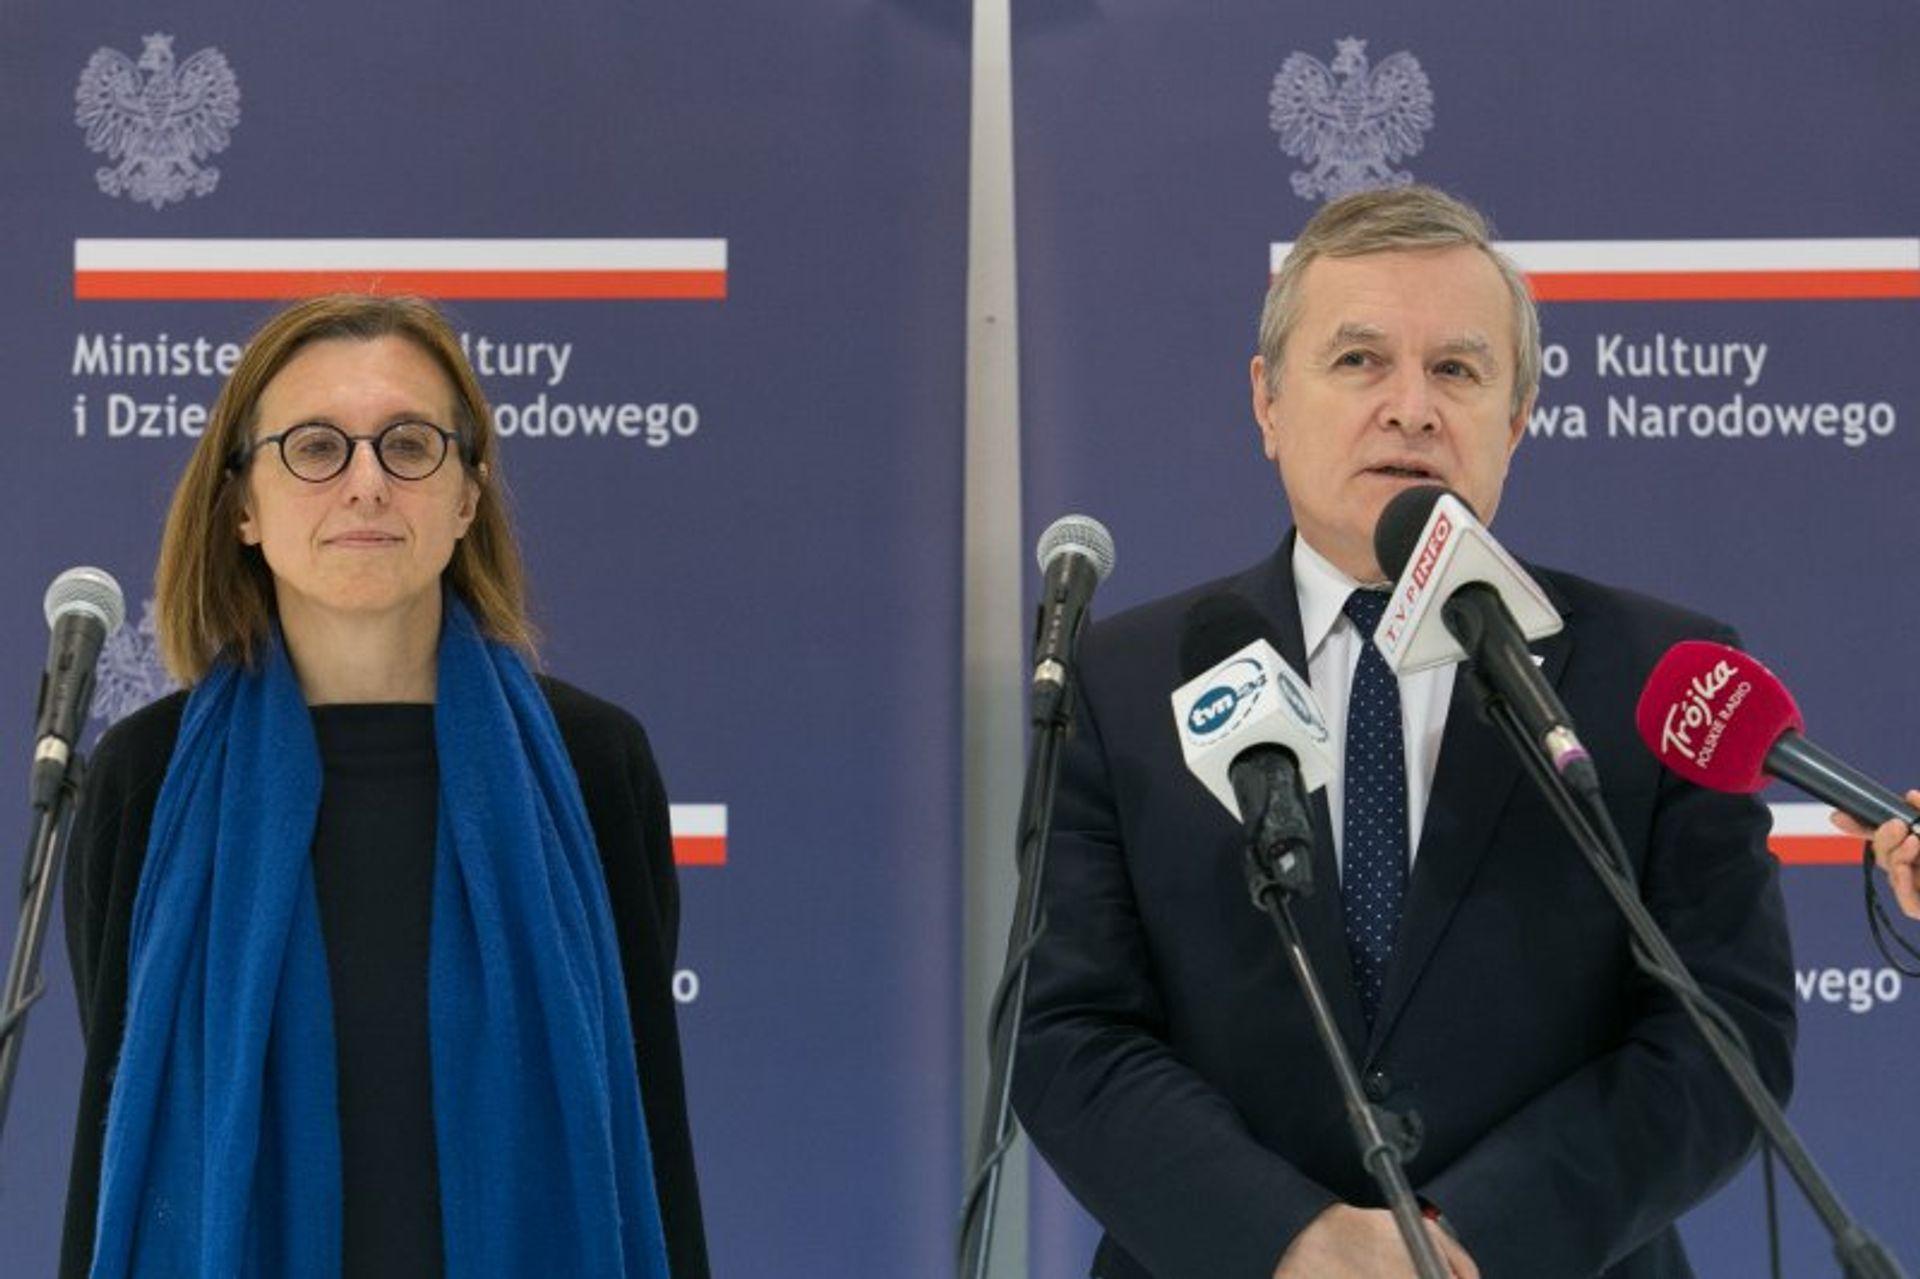 Hanna Wróblewska, the director of the Zacheta National Gallery of Art in Warsaw (left) and Piotr Glínski (right) Photo: Jacek Łagowski